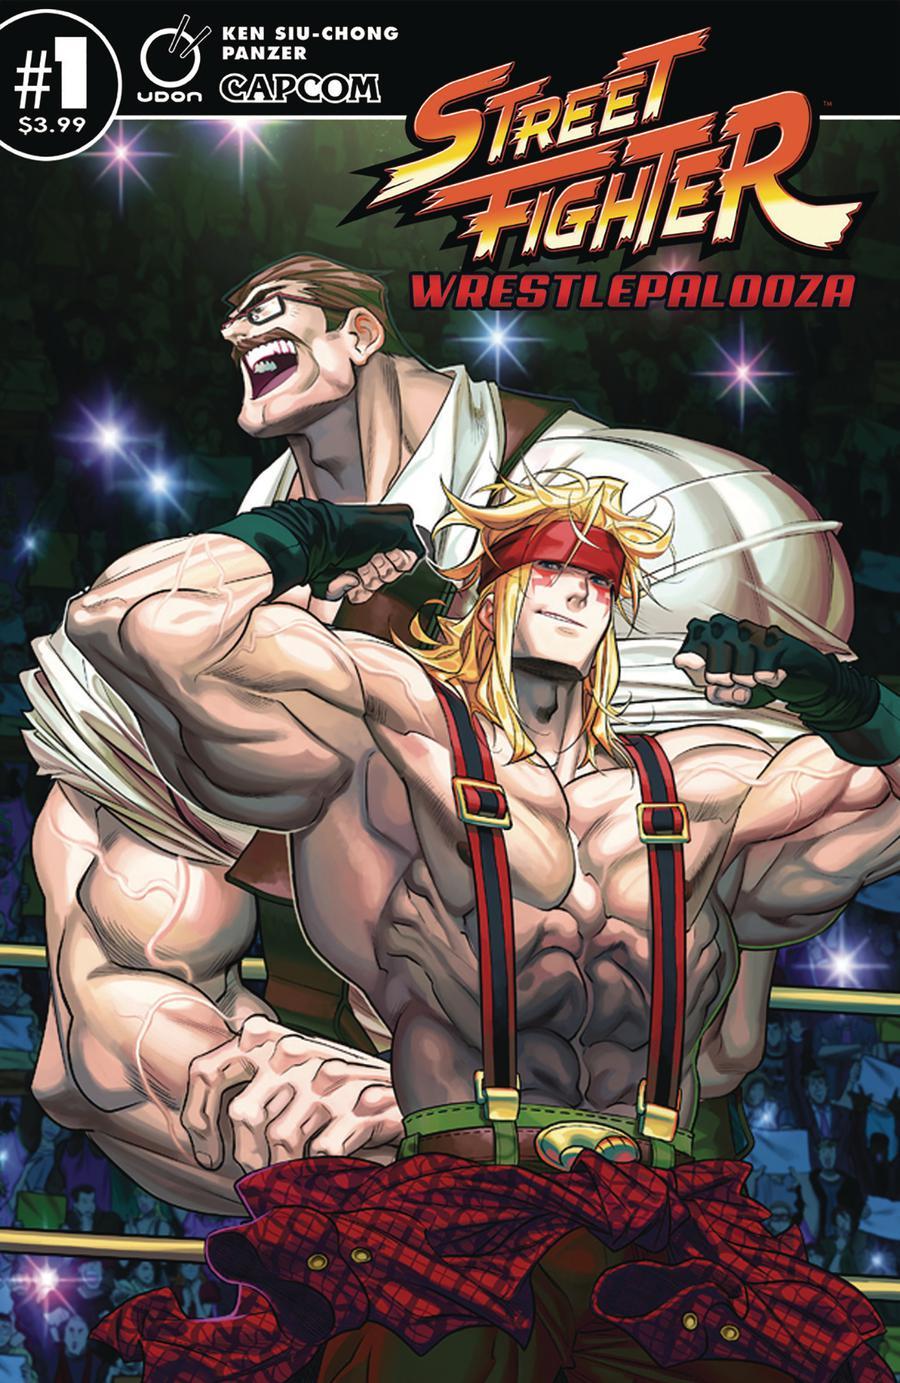 Street Fighter Wrestlepalooza #1 Cover A Regular Panzer Cover